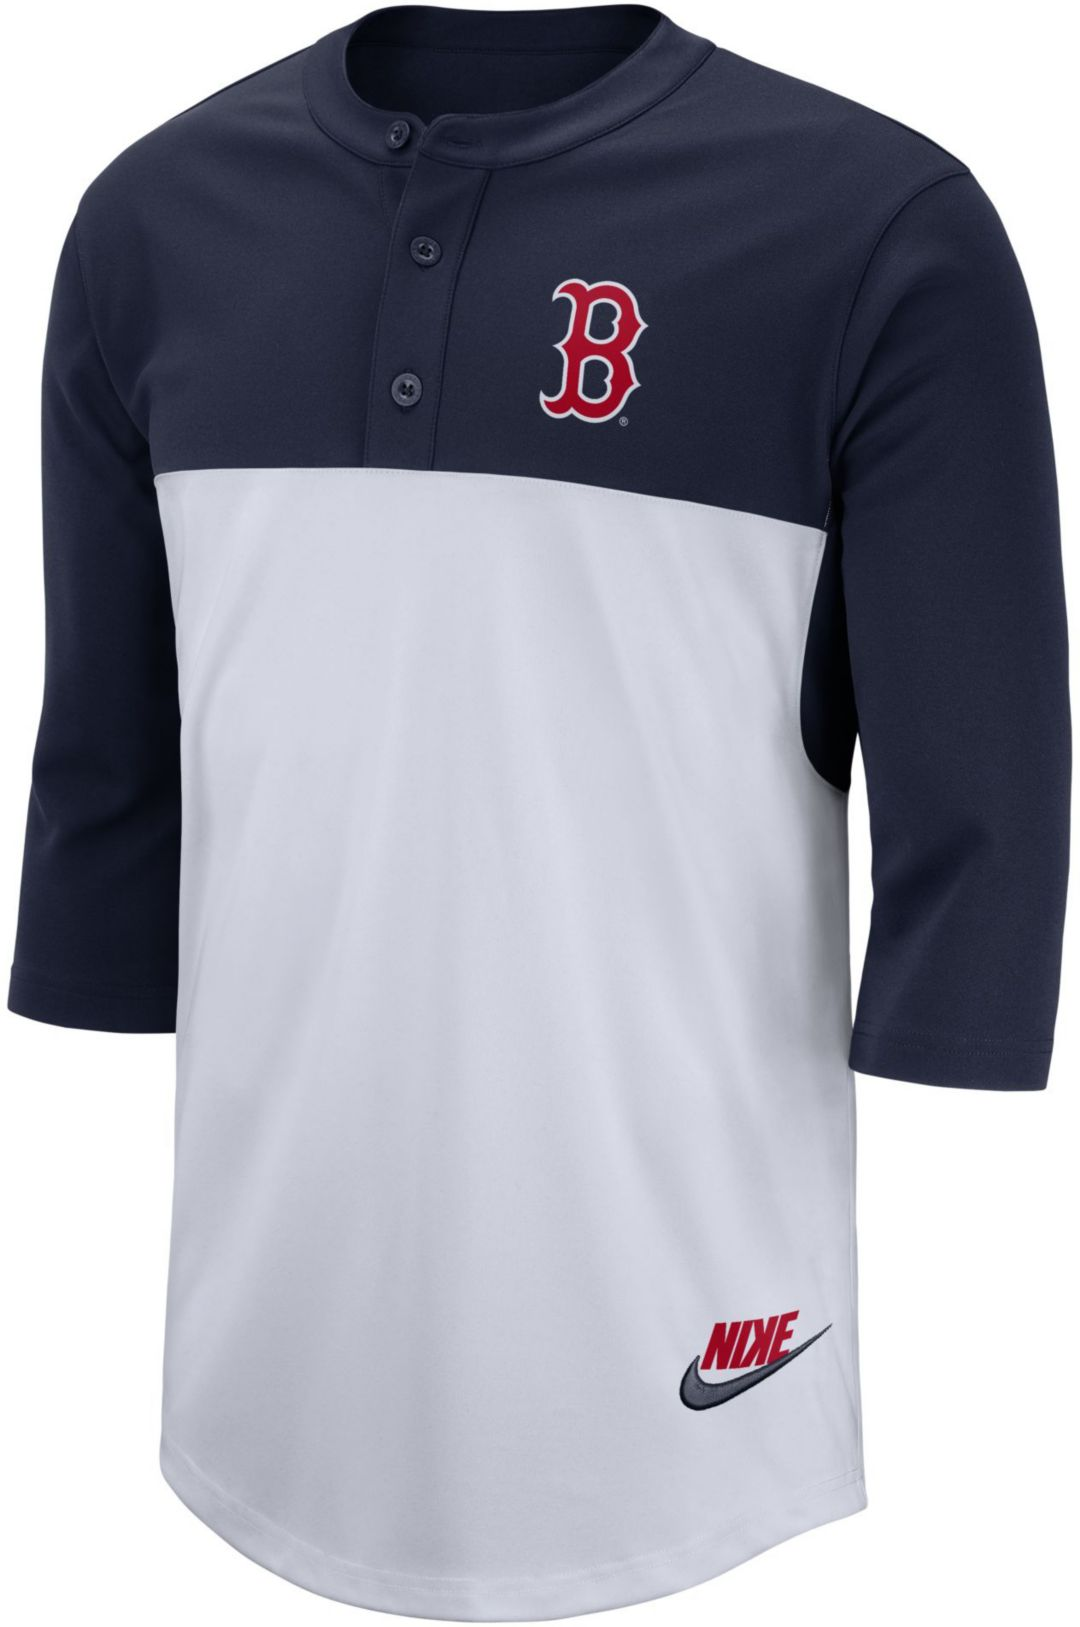 pretty nice 63df3 82e44 Nike Men's Boston Red Sox Dri-FIT Henley Three-Quarter Sleeve Shirt